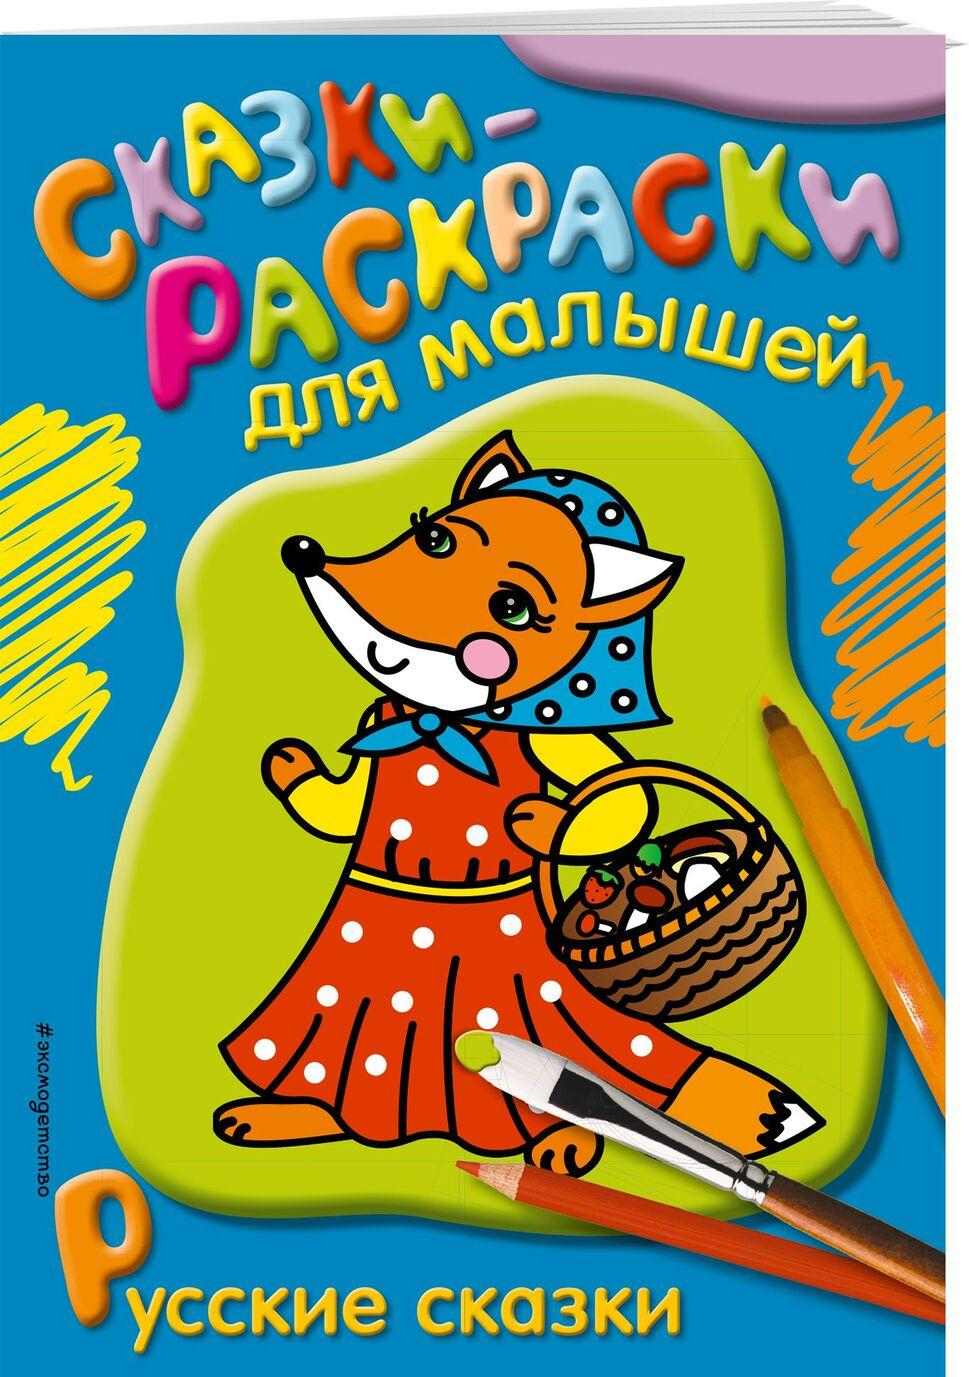 Russkie skazki